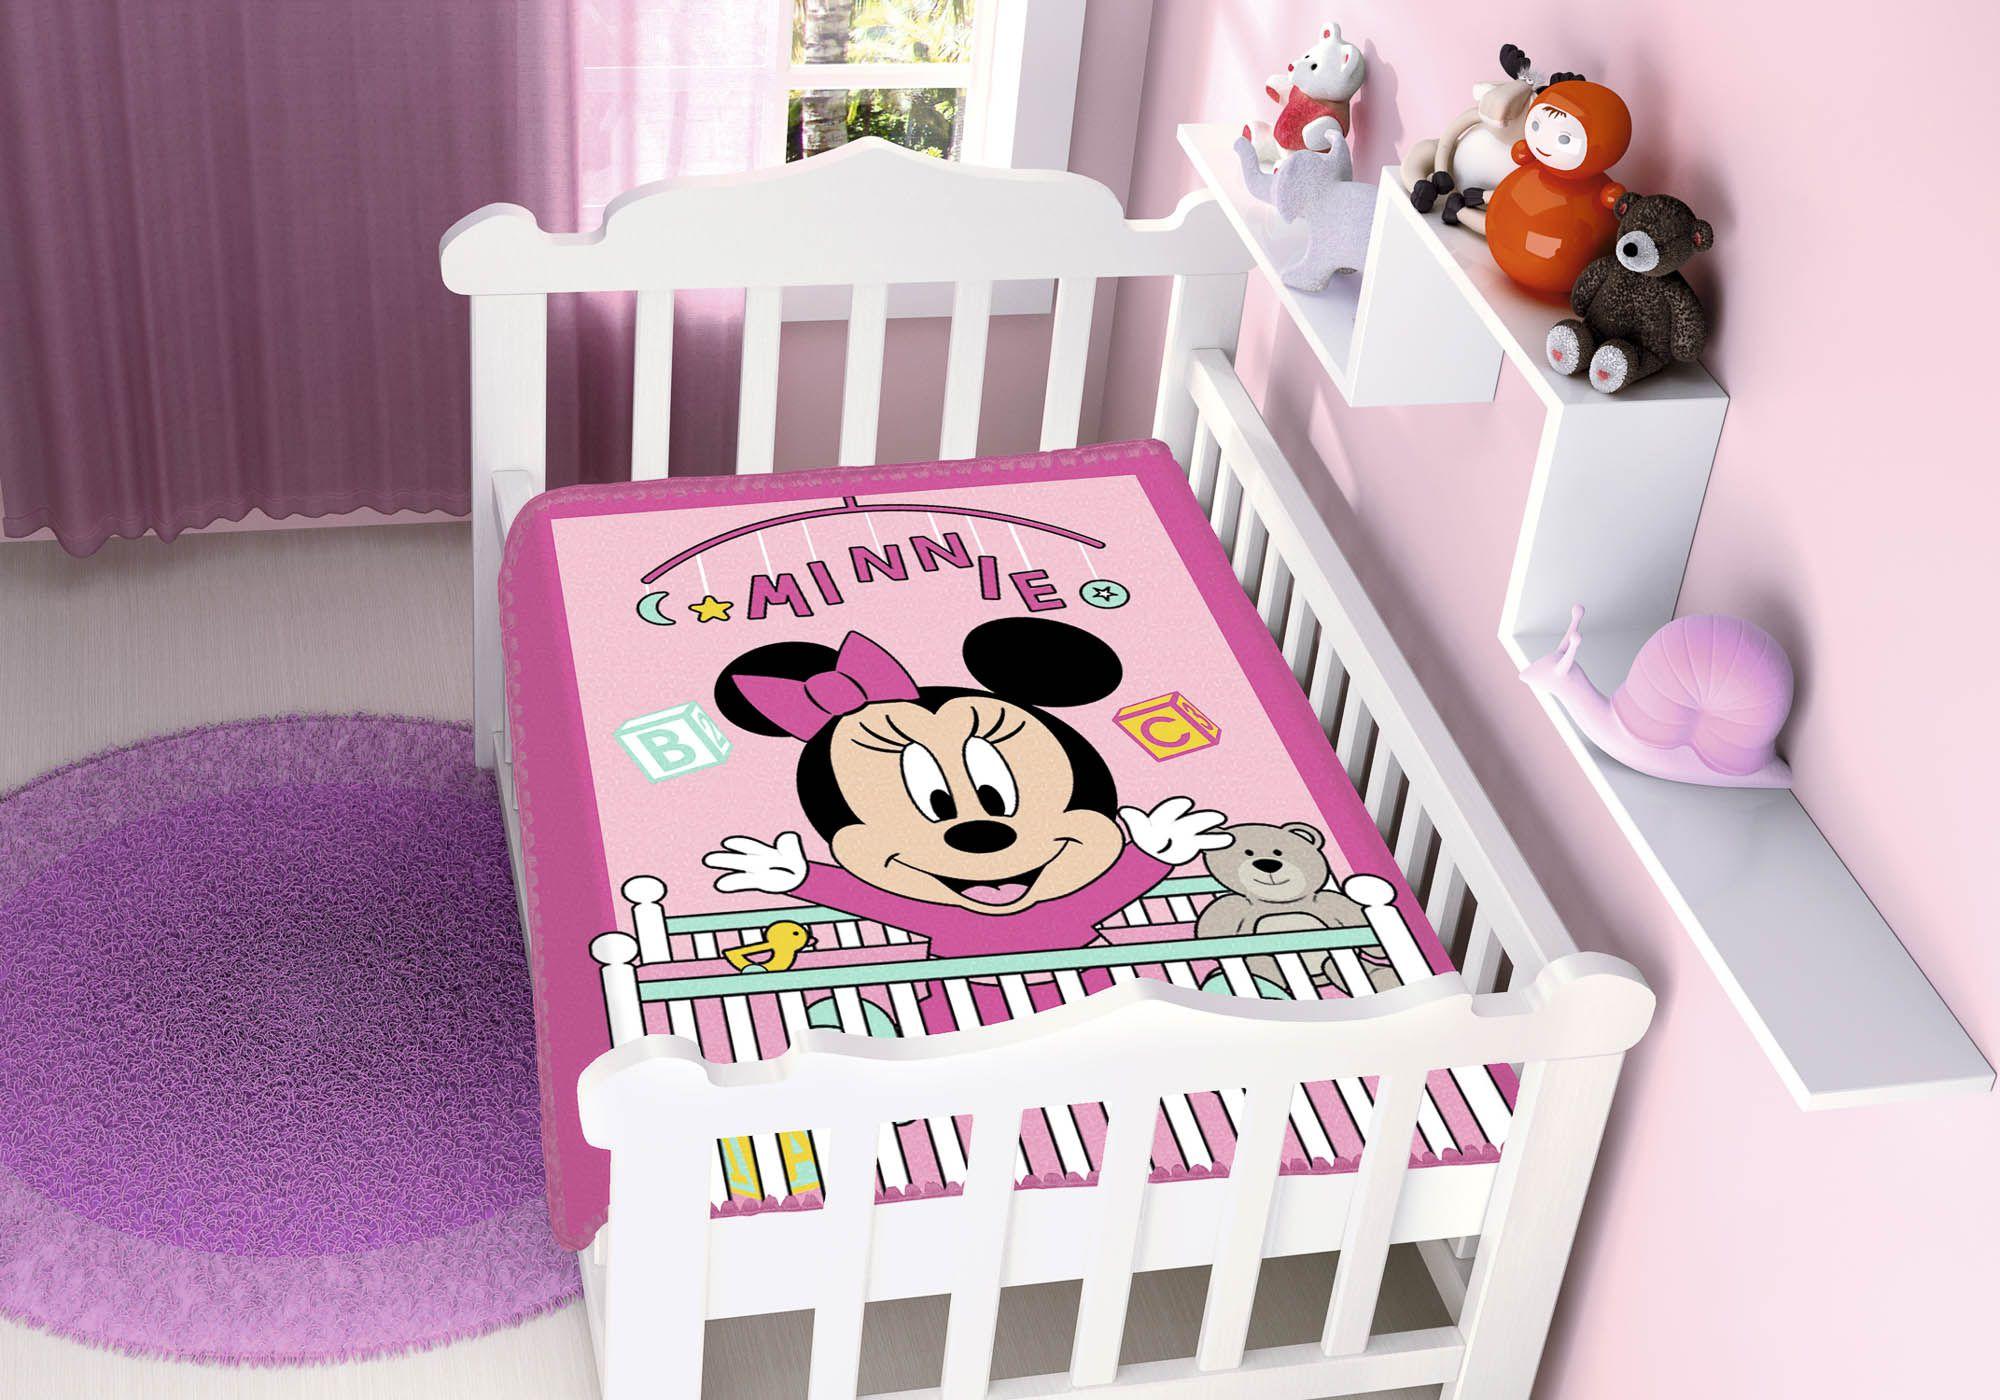 Cobertor Jolitex Raschel Infantil 0,90x1,10m Disney Minnie Bercinho